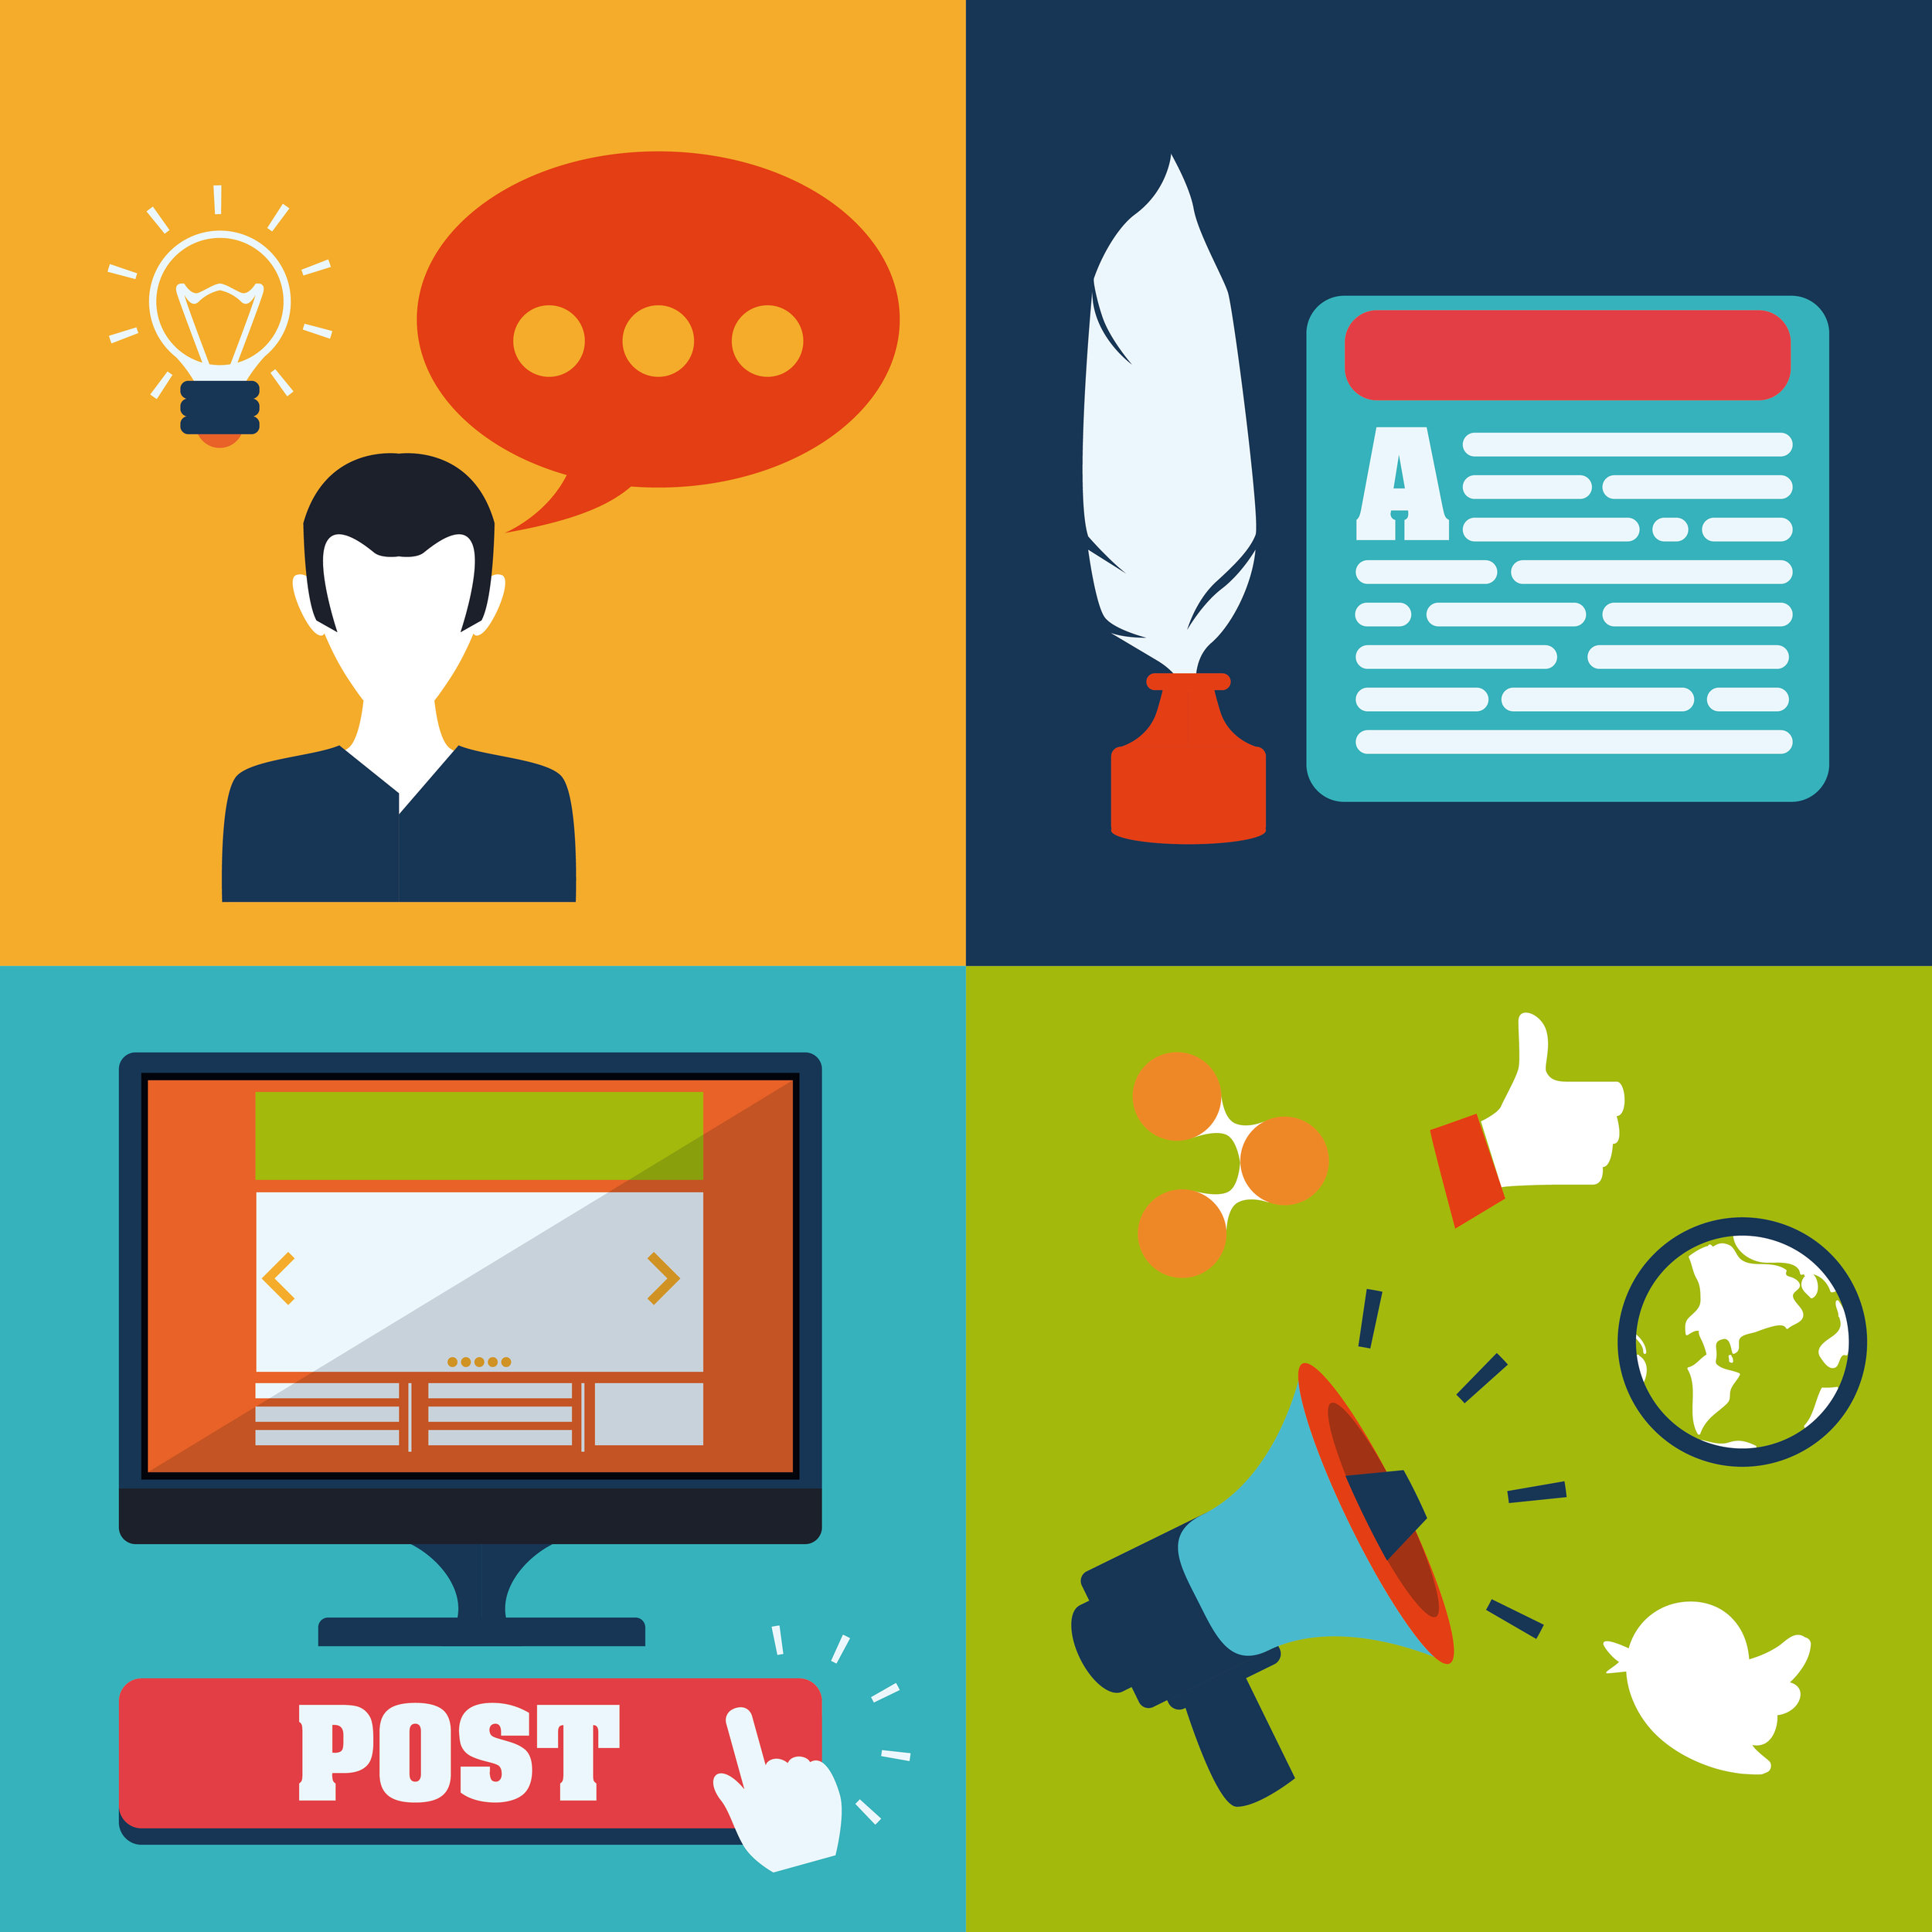 Blogging icon.jpg